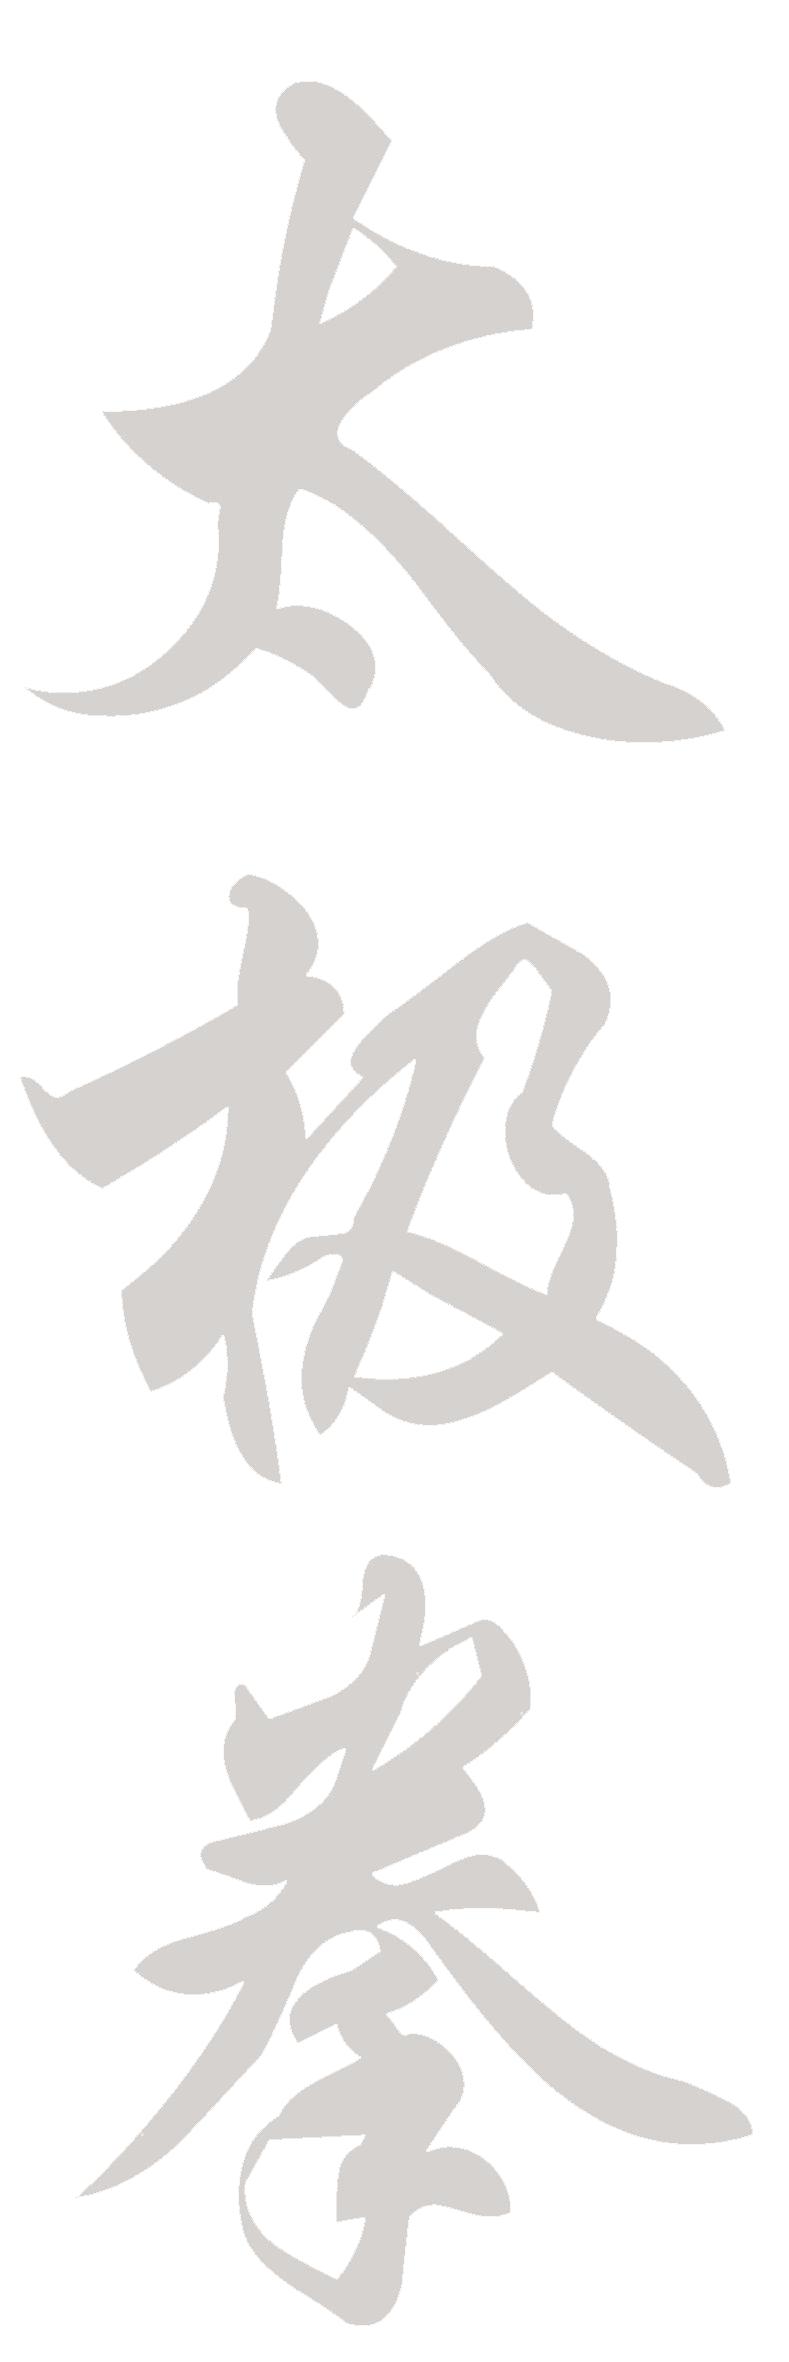 taijichuan Chinesische Medizin Frankfurt